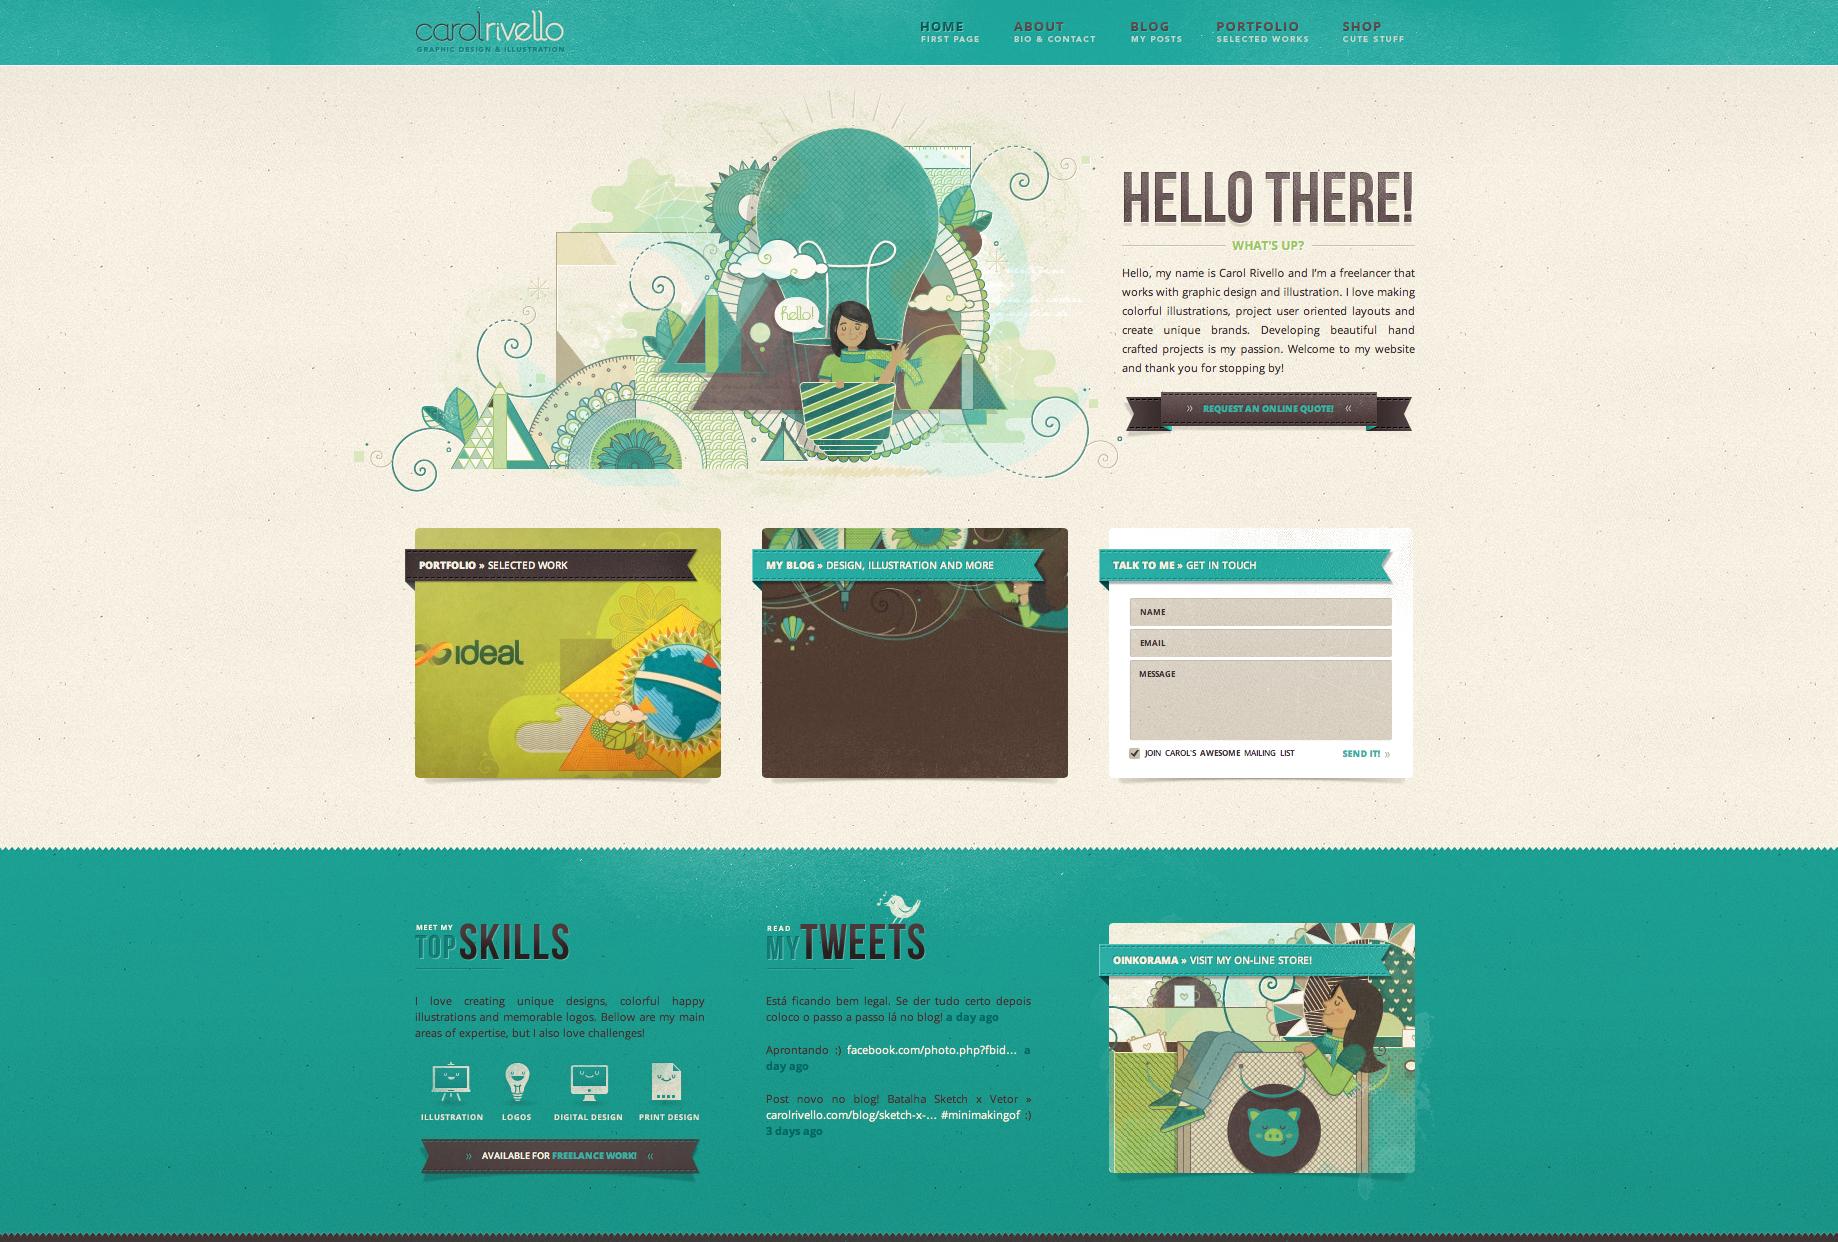 Texture website design: http://www.carolrivello.com